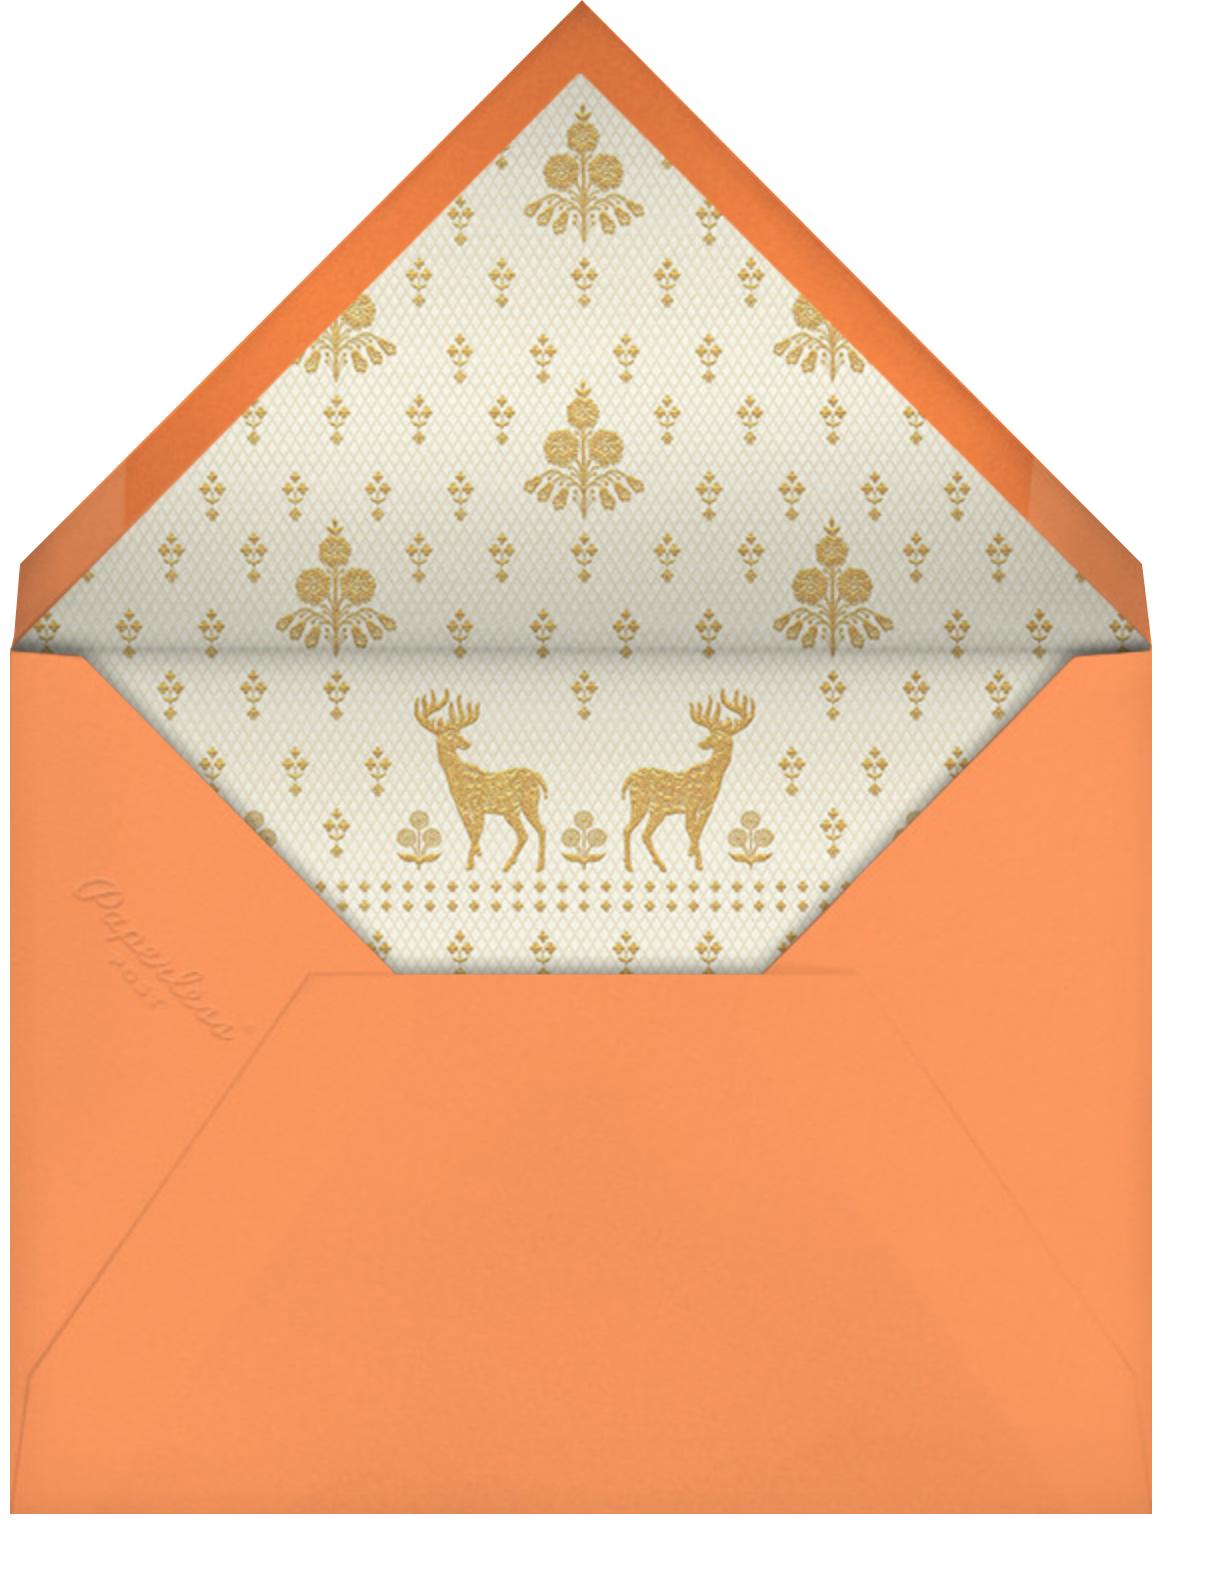 Aashna (Sangeet) - Topaz - Anita Dongre - Indian - envelope back